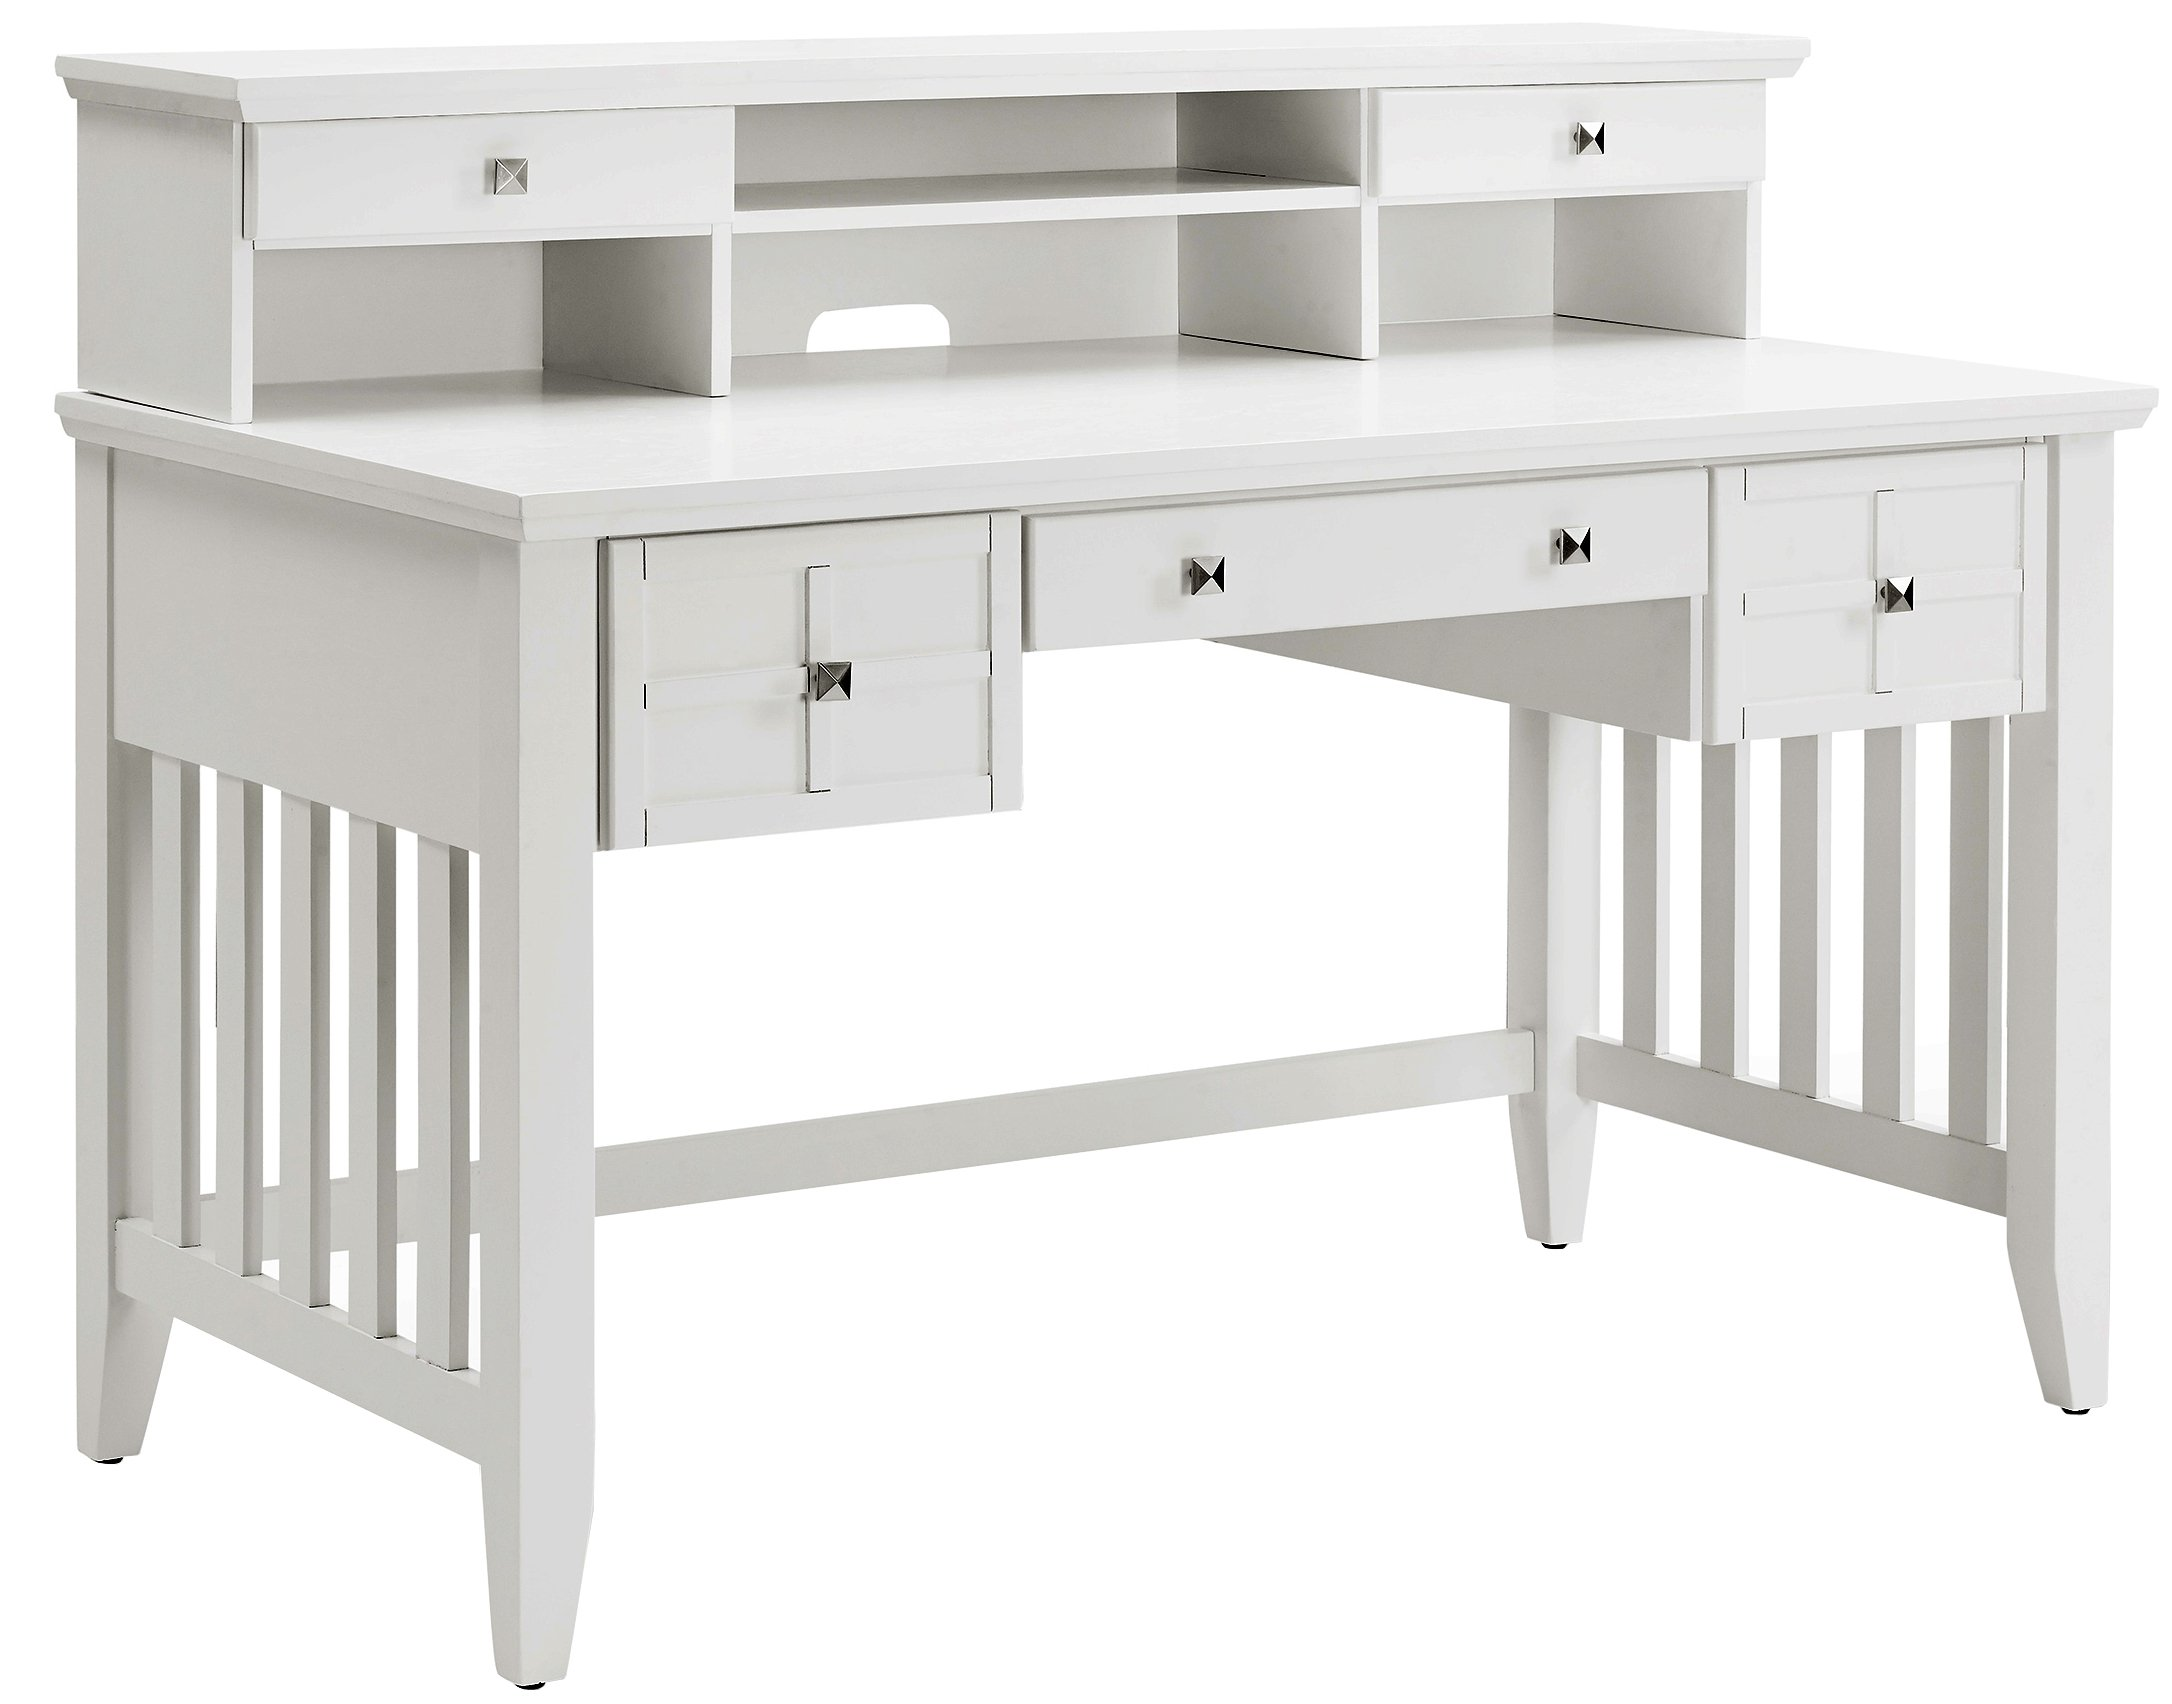 Crosley Furniture KF65003WH Adler Computer Desk with Hutch - White